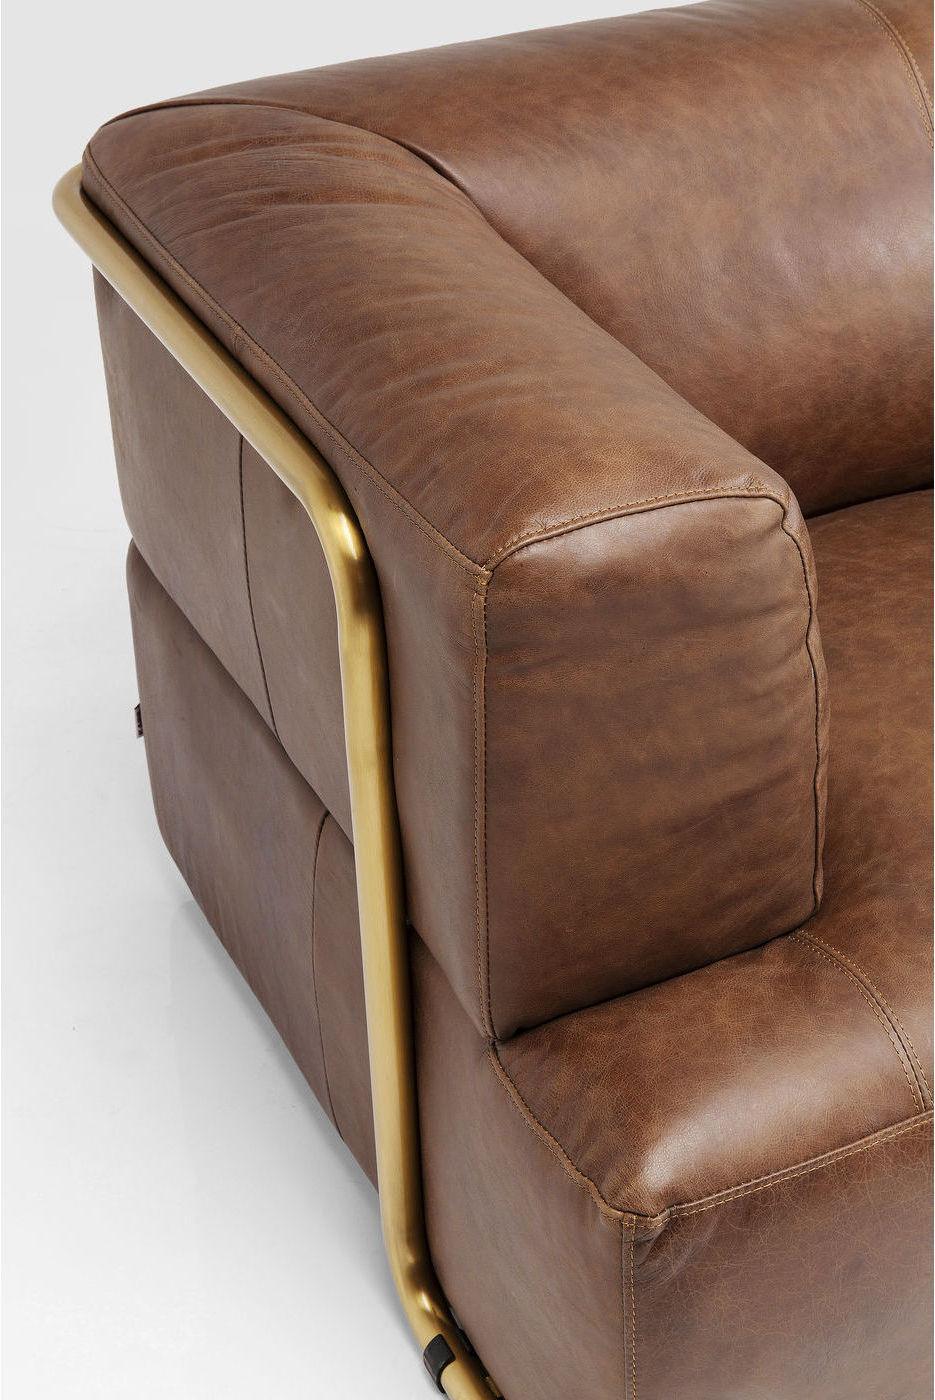 Kare Design Salto 3-Zits Bank - B210 Cm - Leer Bruin